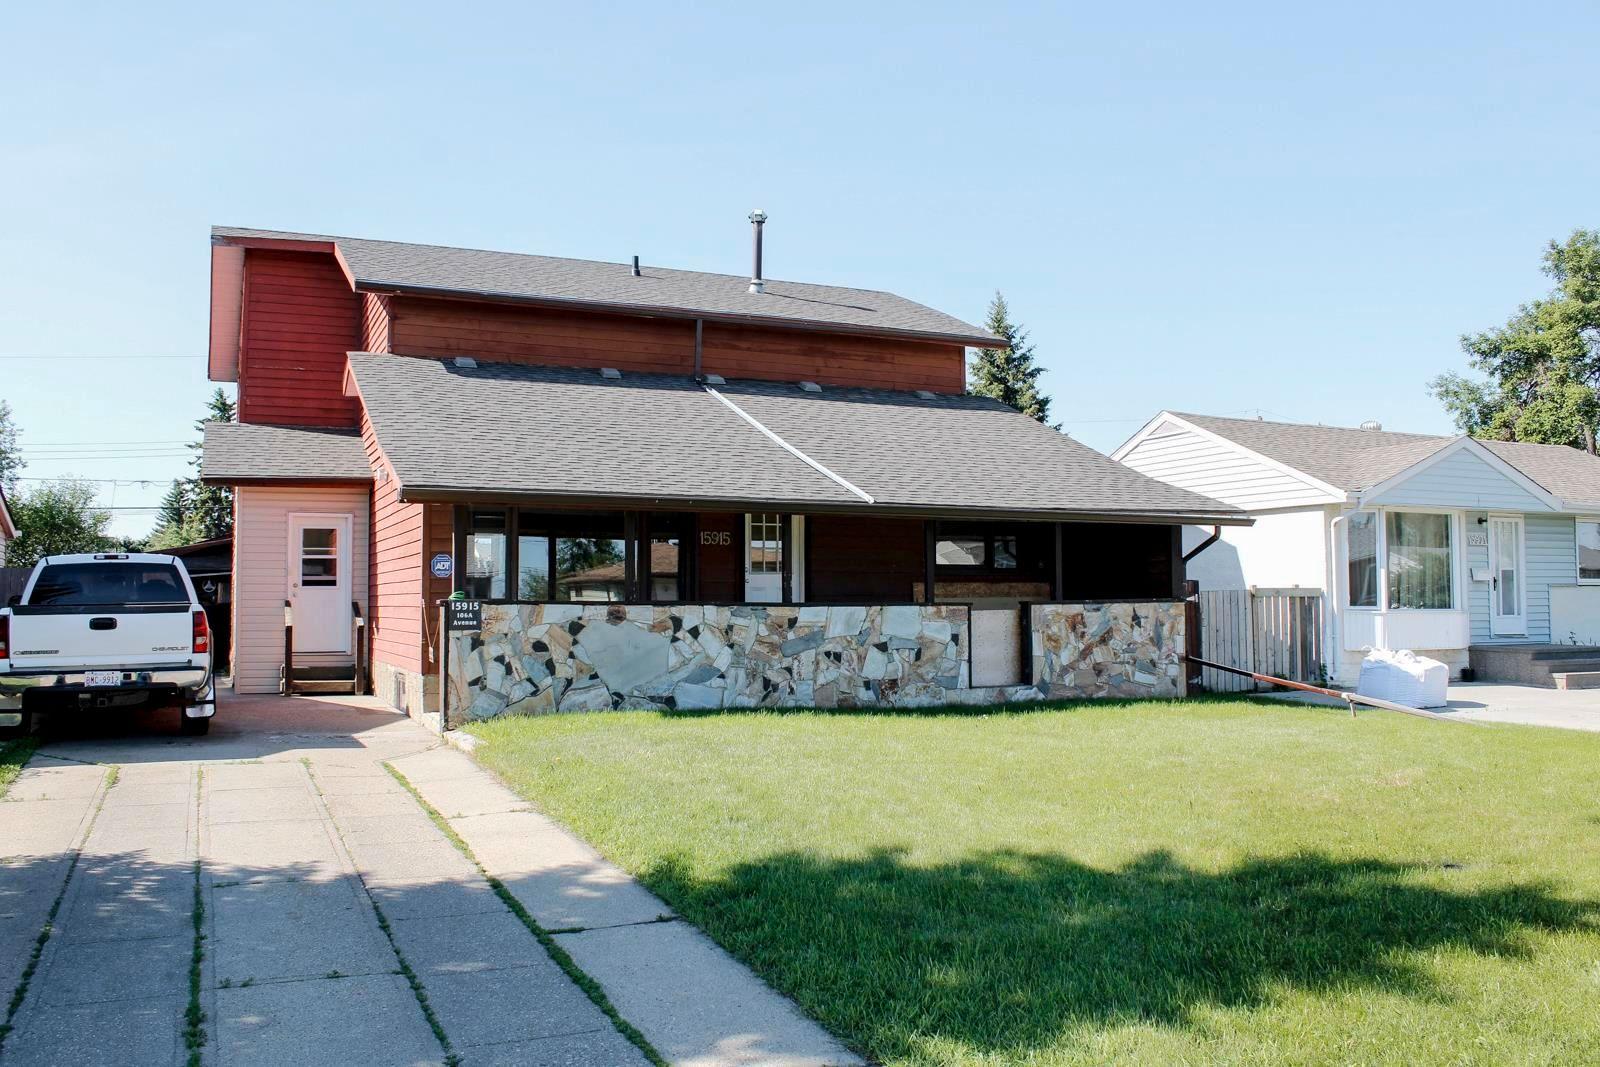 Main Photo: 15915 106A Avenue in Edmonton: Zone 21 House for sale : MLS®# E4251375